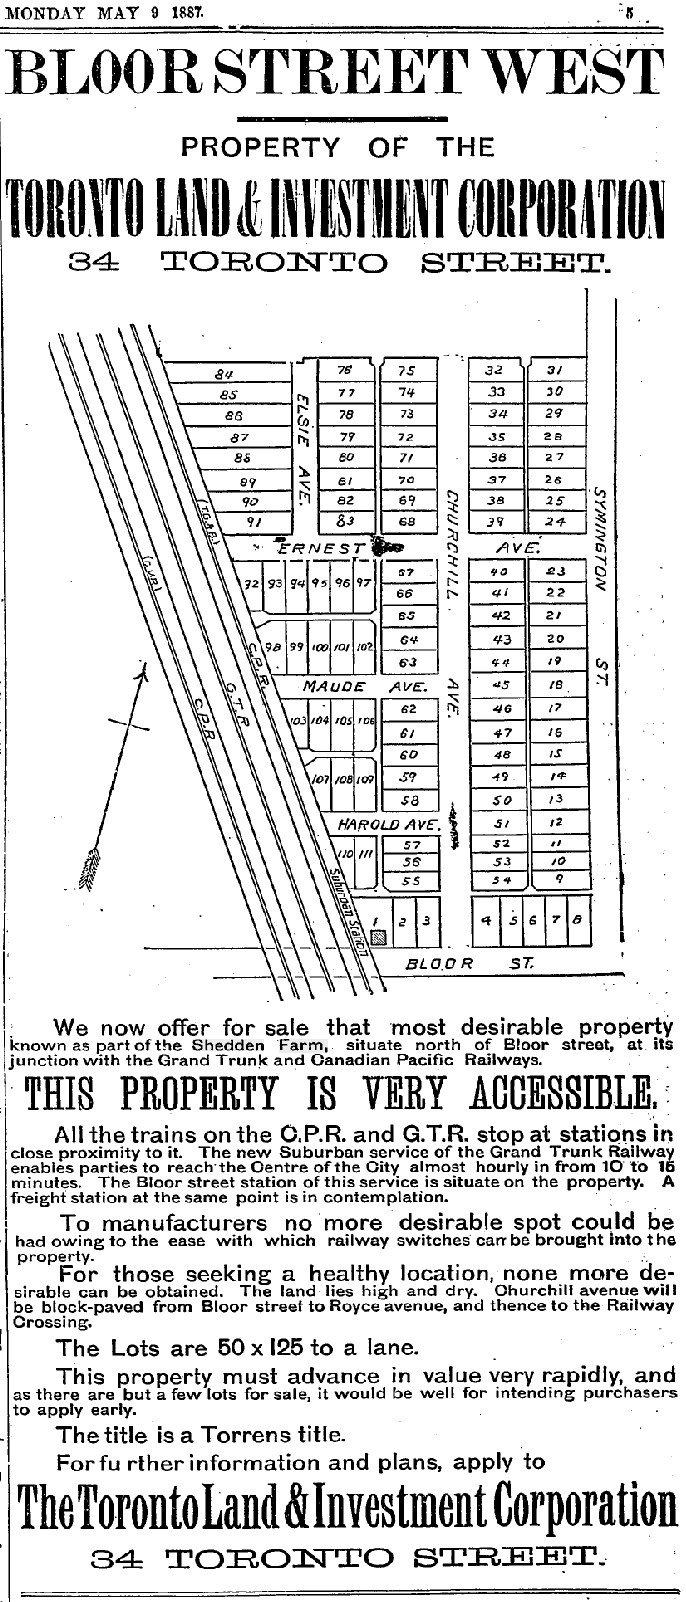 1887 Property Sale